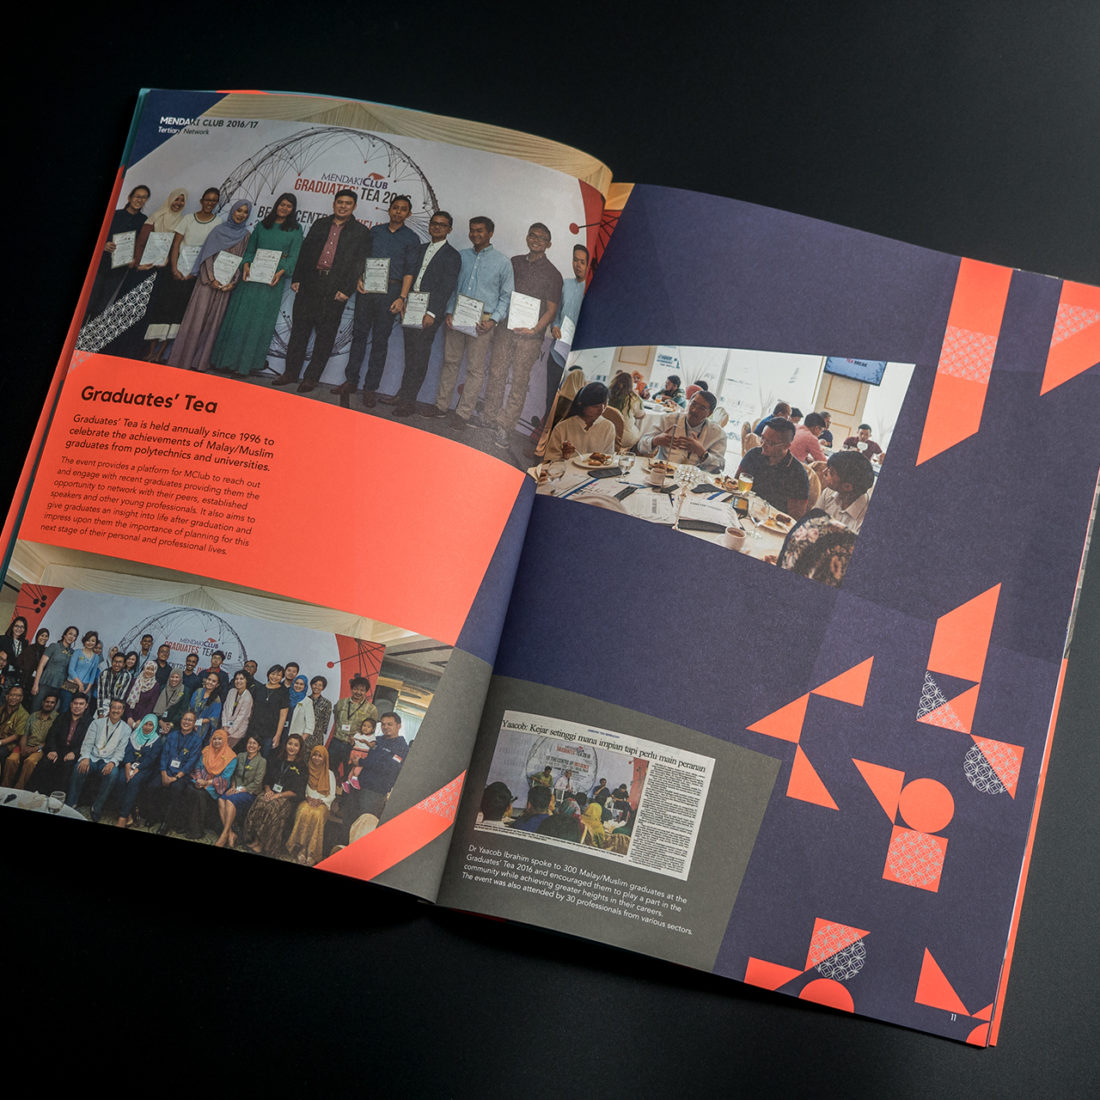 Mendaki Club year book collateral design